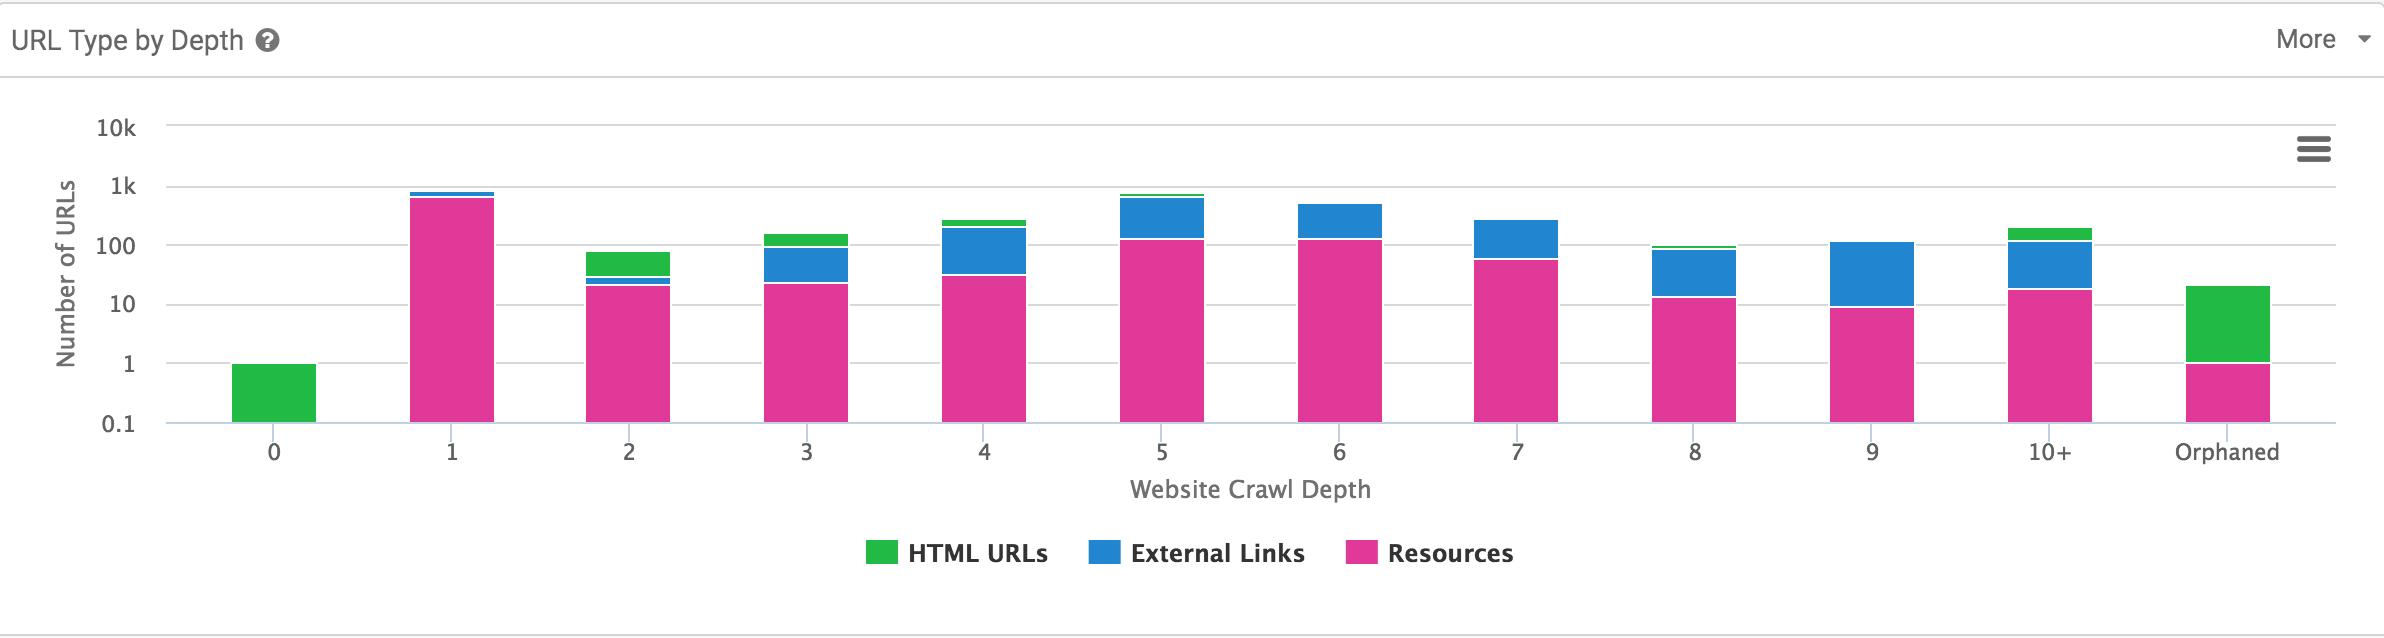 url type depth sitebulb